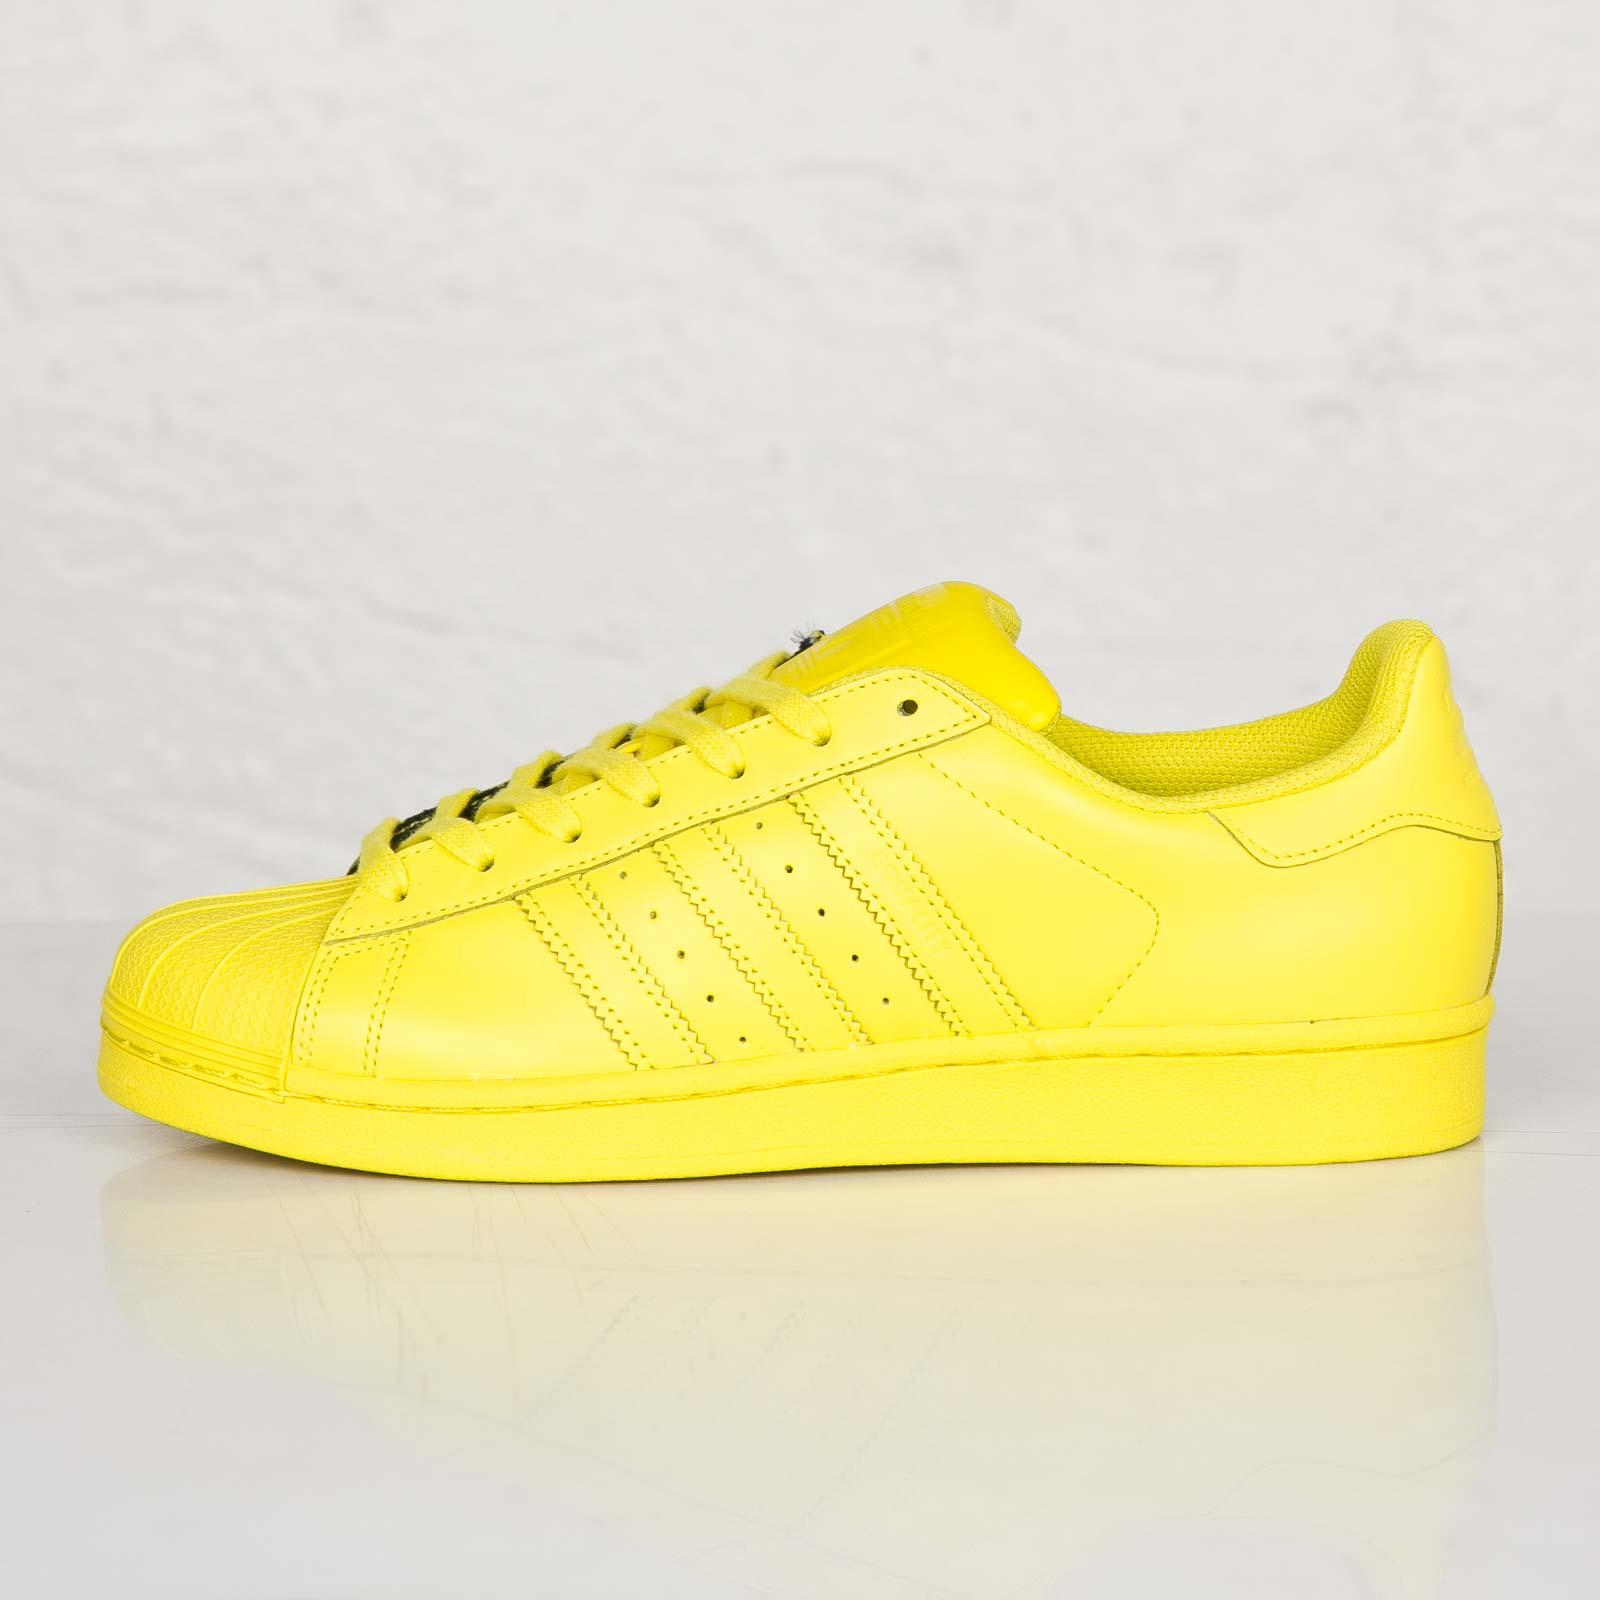 99e5c3ca8a6da cheap adidas superstar supercolor bright yellow a9be5 fb15d